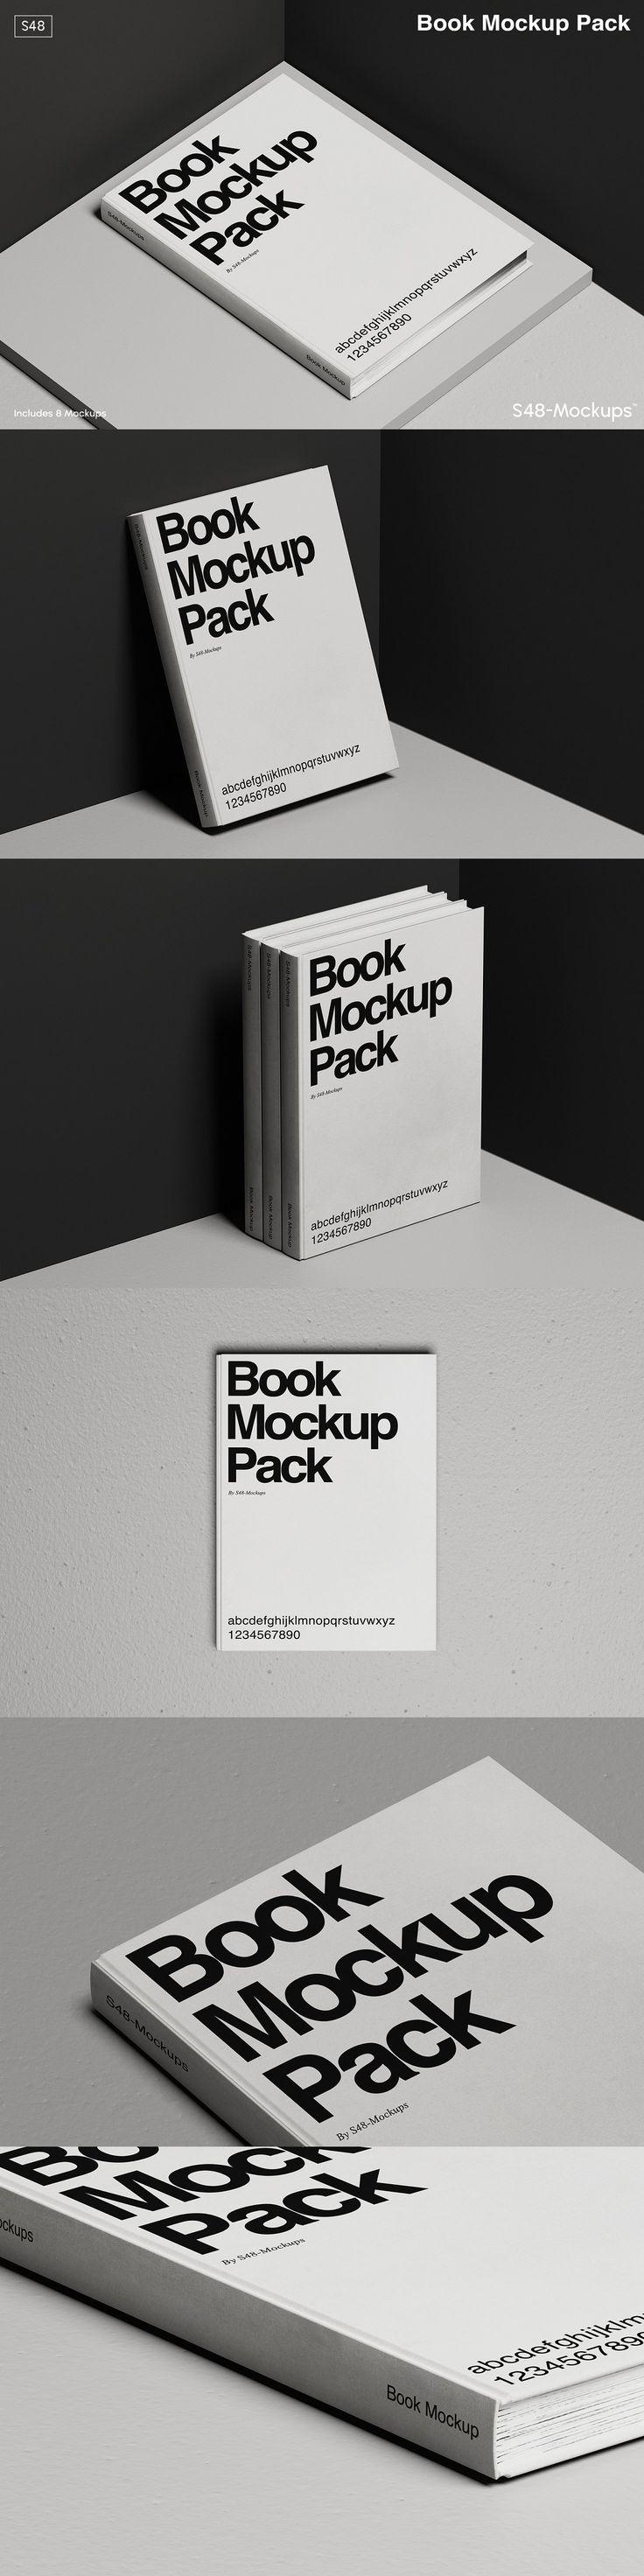 Book Mockup Pack Graphic Design Branding Mockup Mock Up Templates Mockup Ideas Mockup Ps Design Print Layout Design Pattern Art Background For Photography